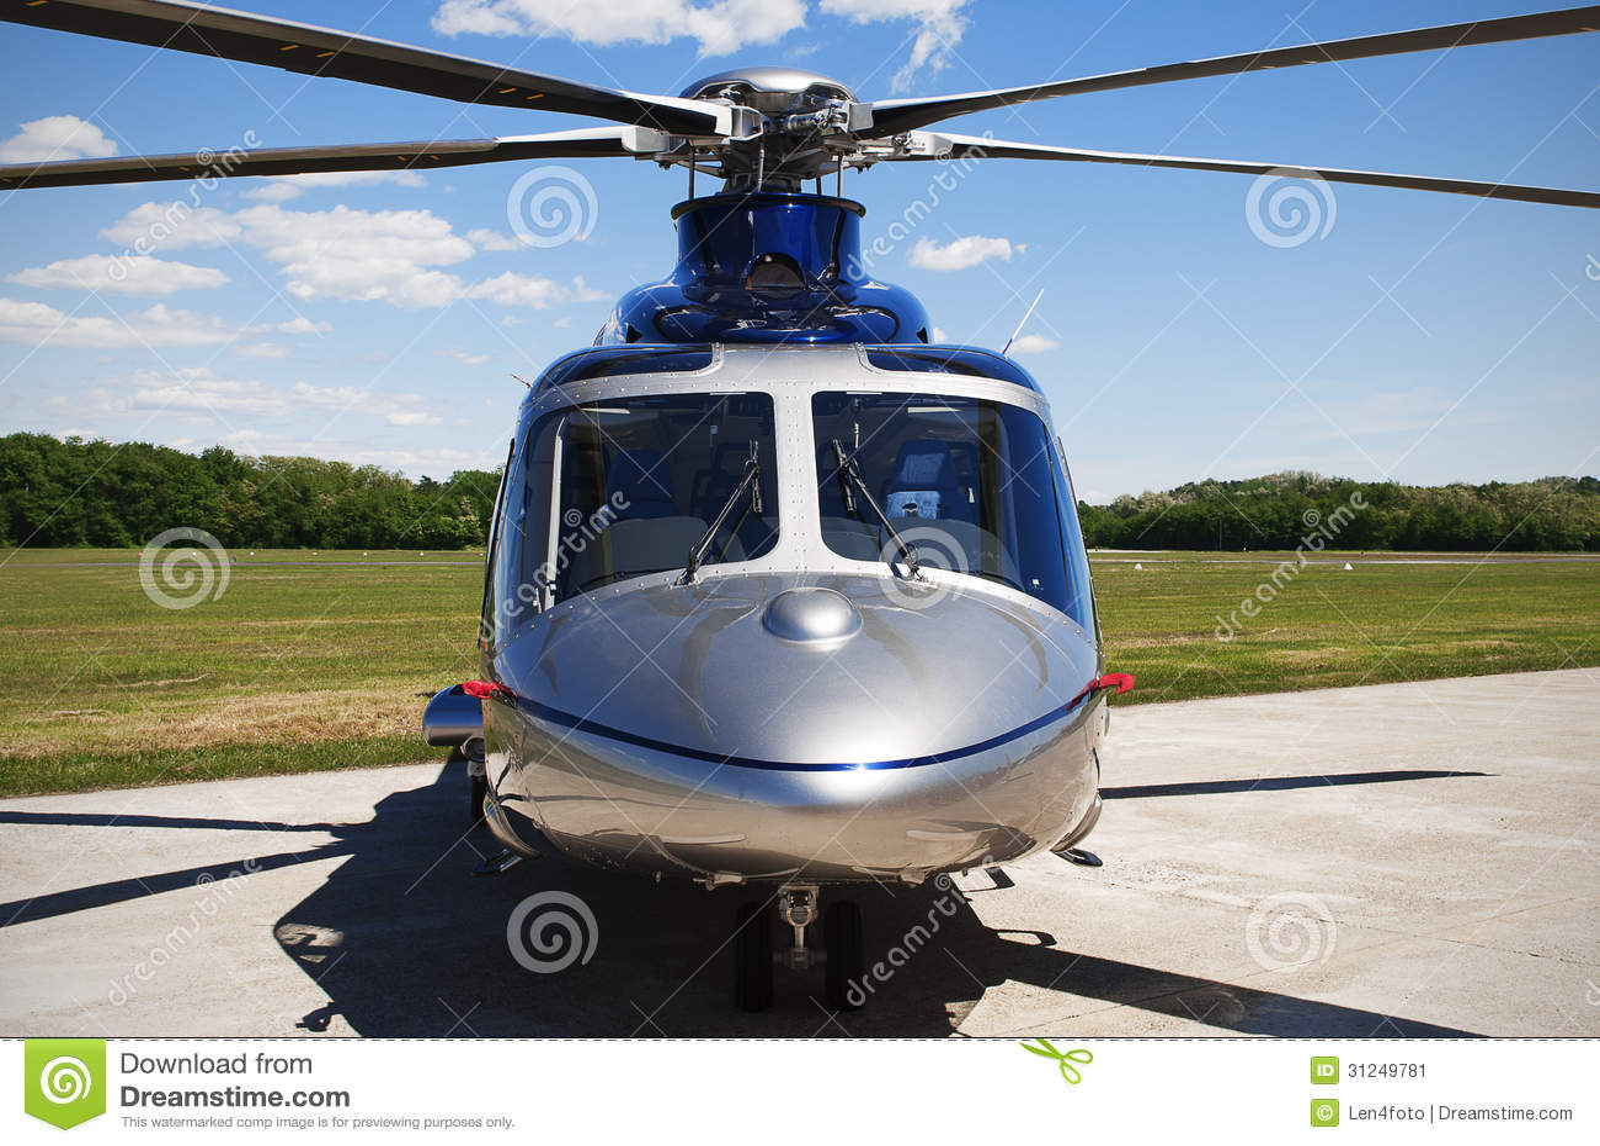 Elicottero Grigio : Grey helicopter stock image